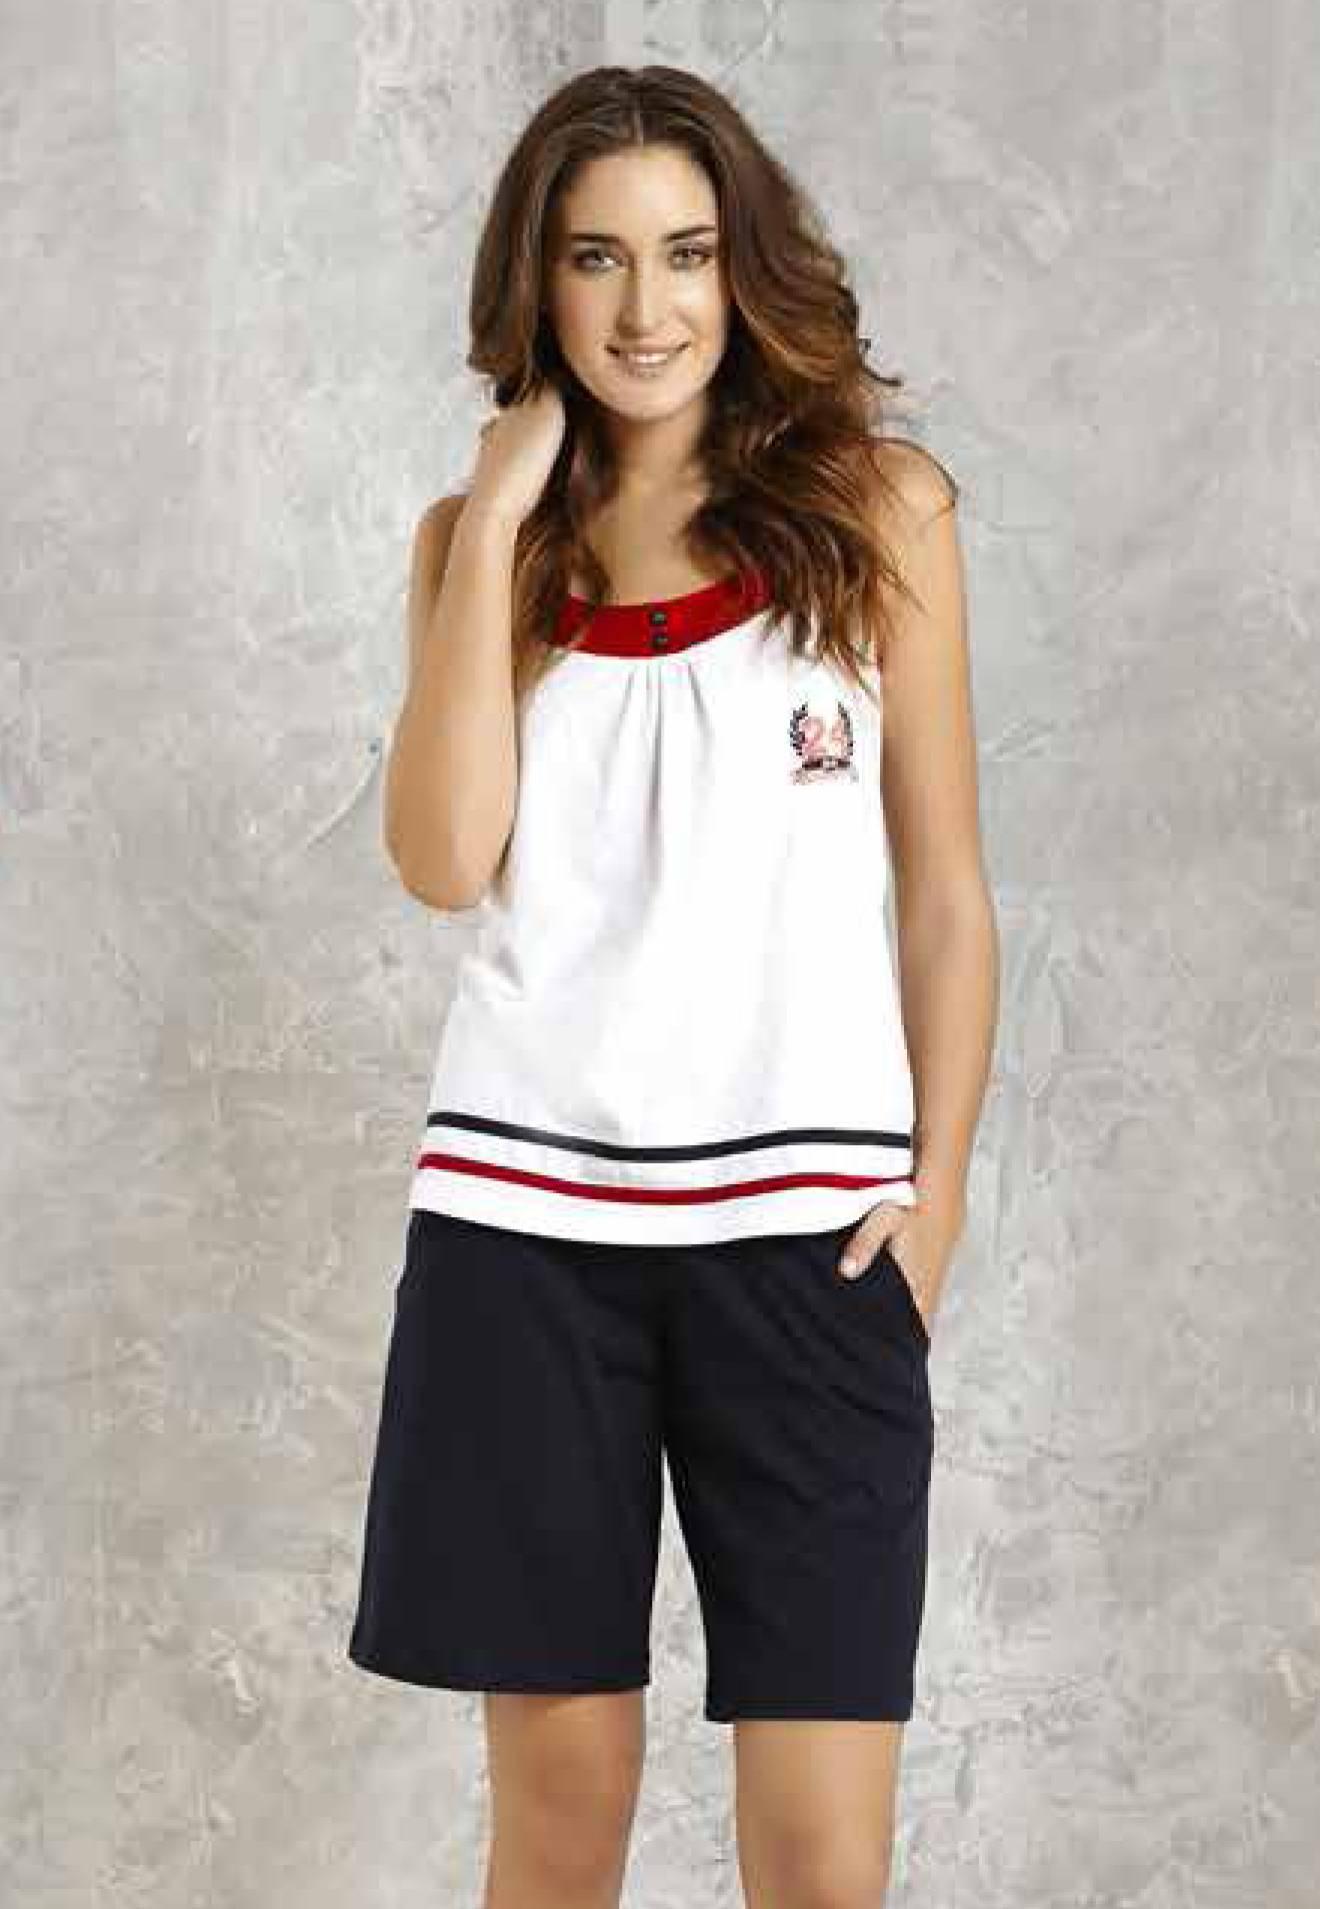 Mod Collection Bayan Atlet Şort Takım 1404